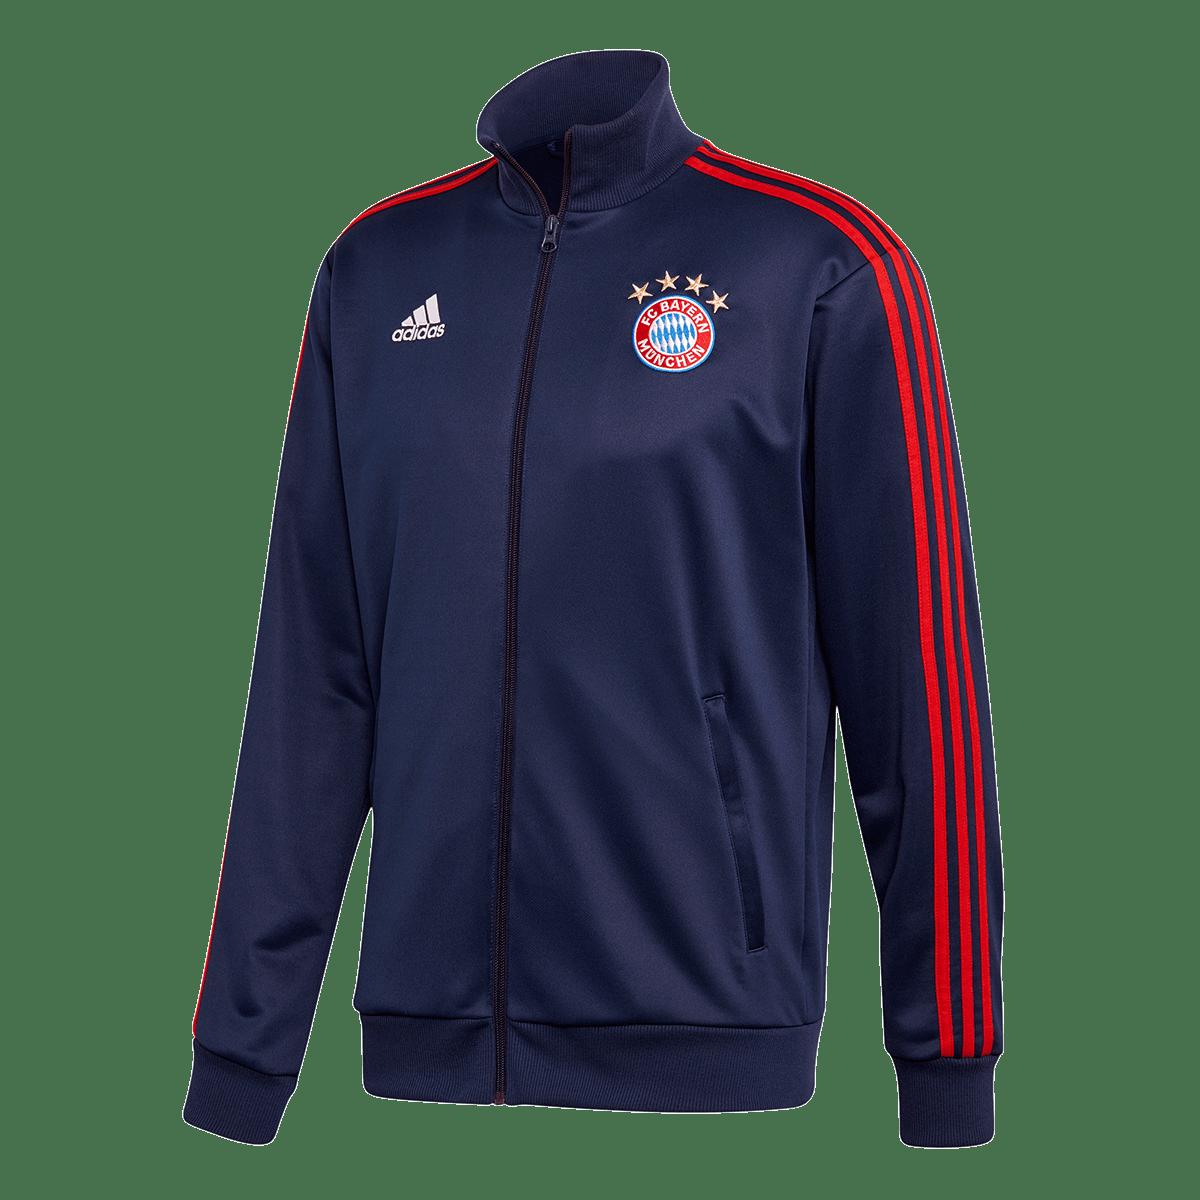 adidas FC Bayern München Trainingsjacke 3S Track Top dunkelblaurot